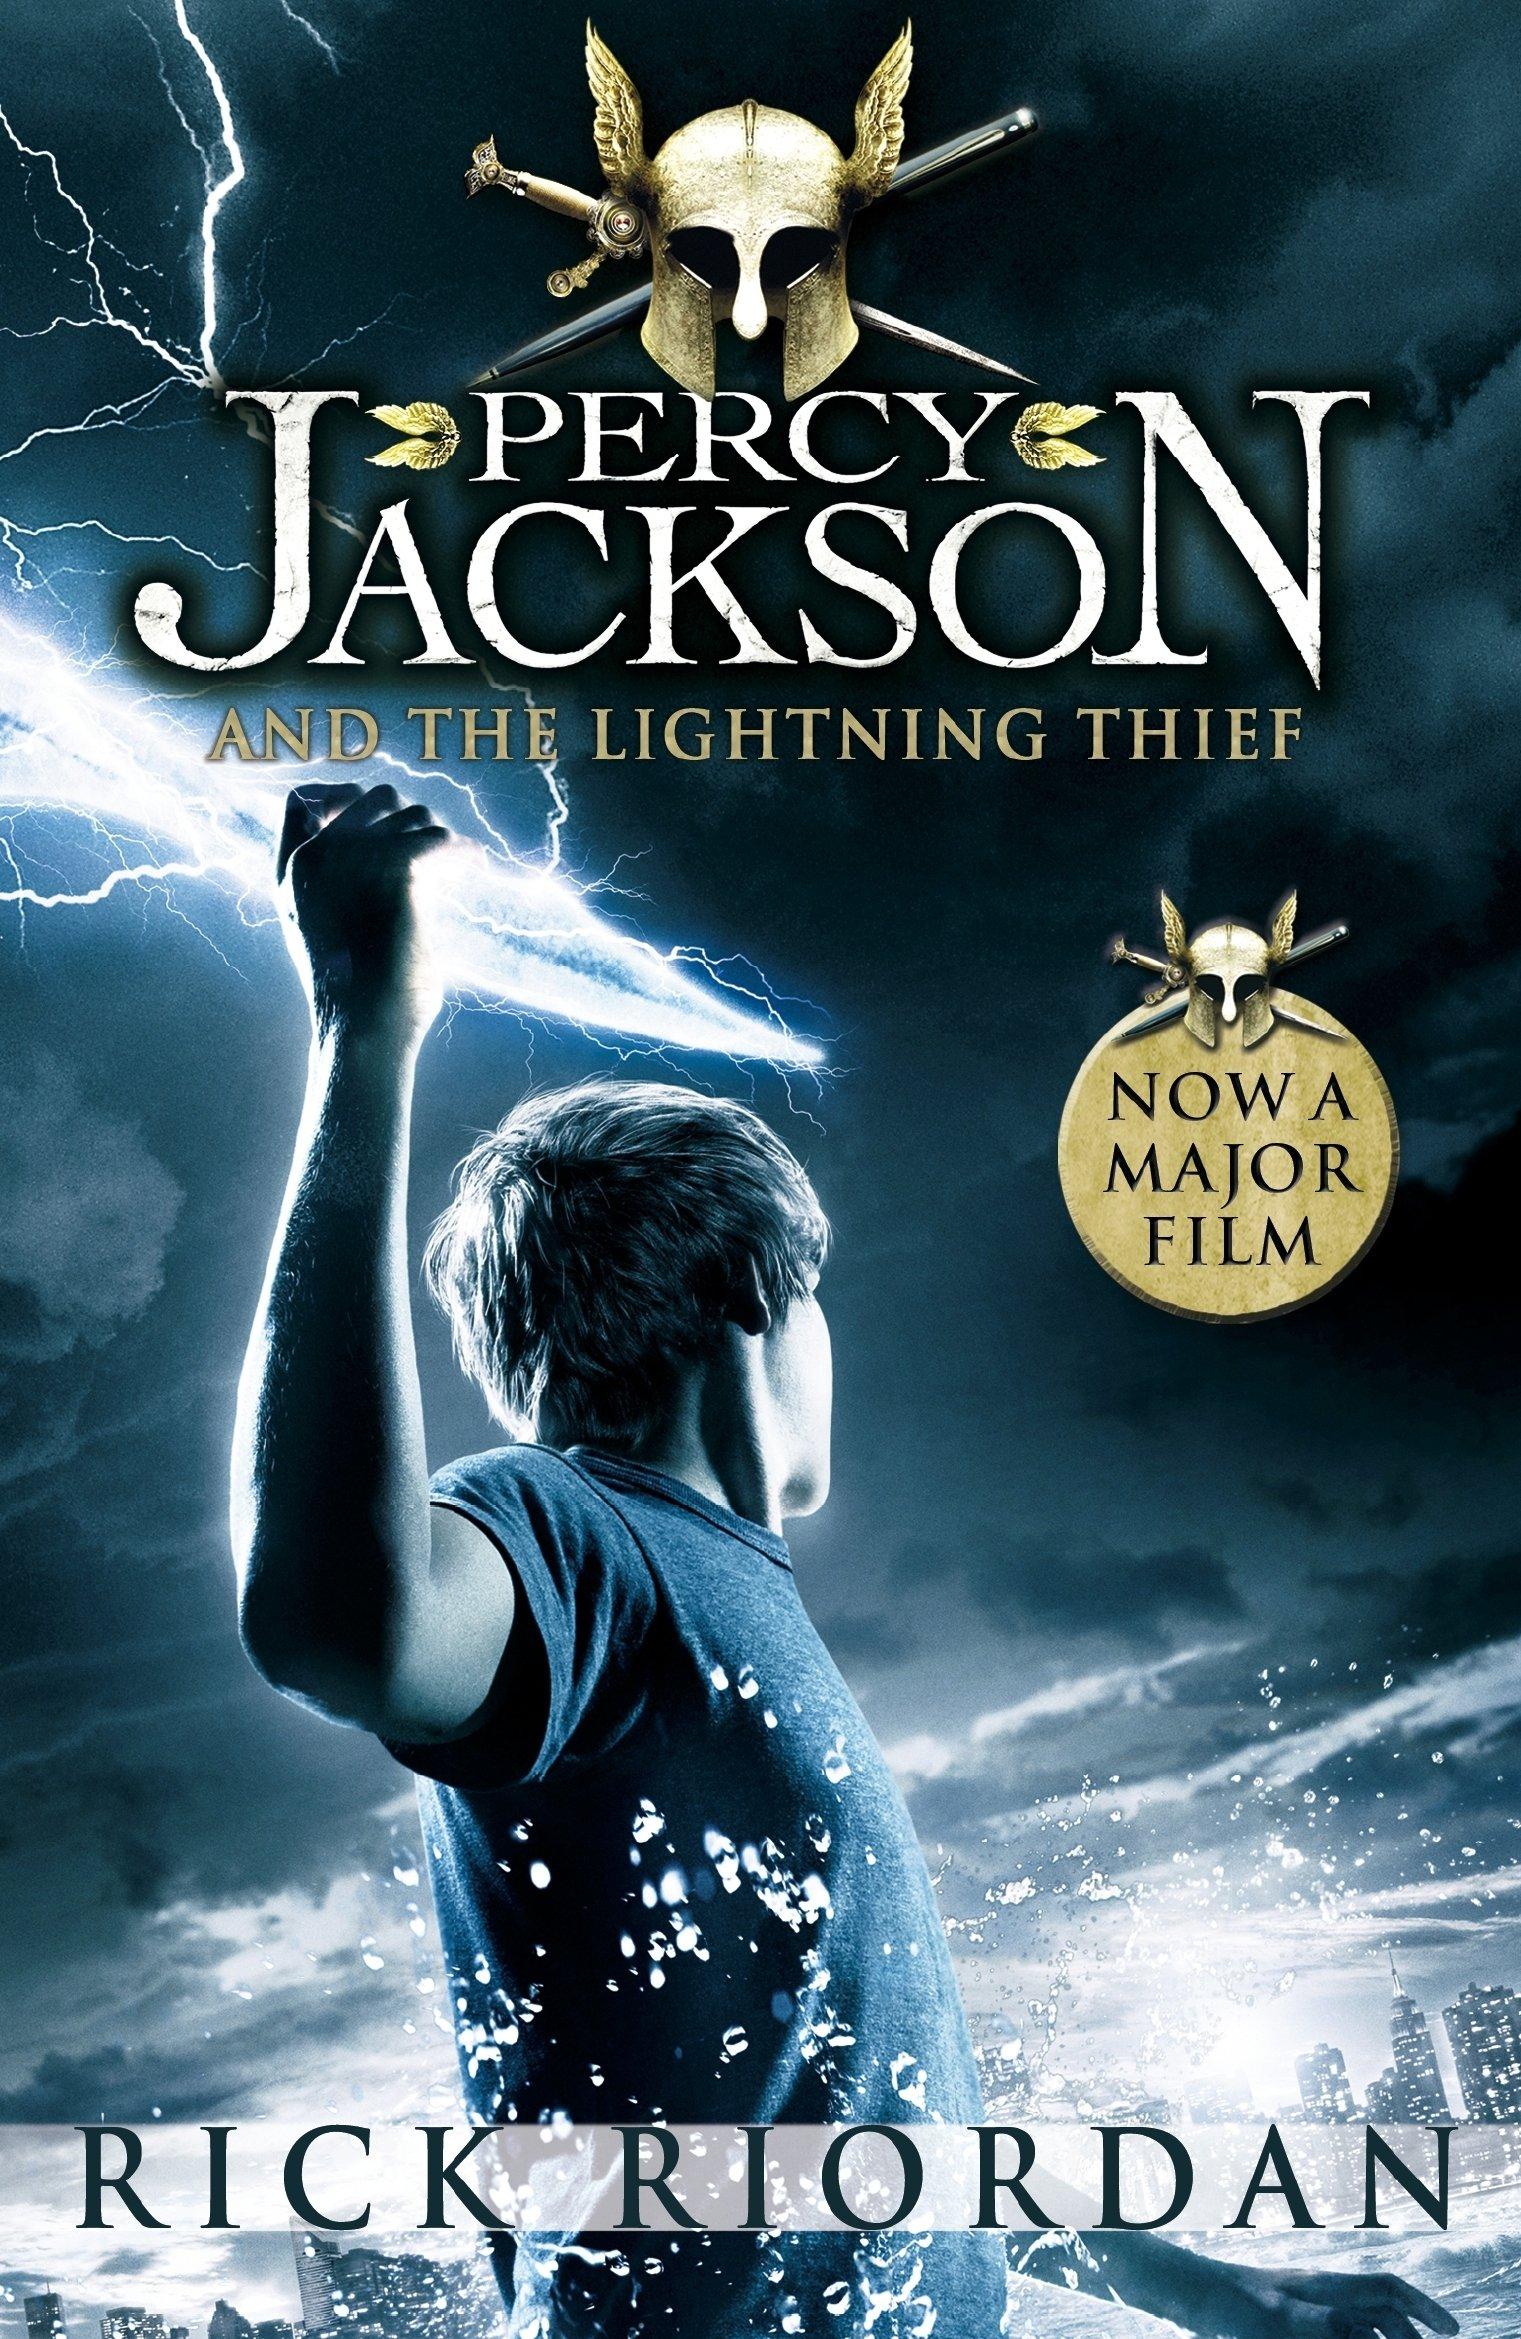 percy jackson and the lightning thief rick riordan